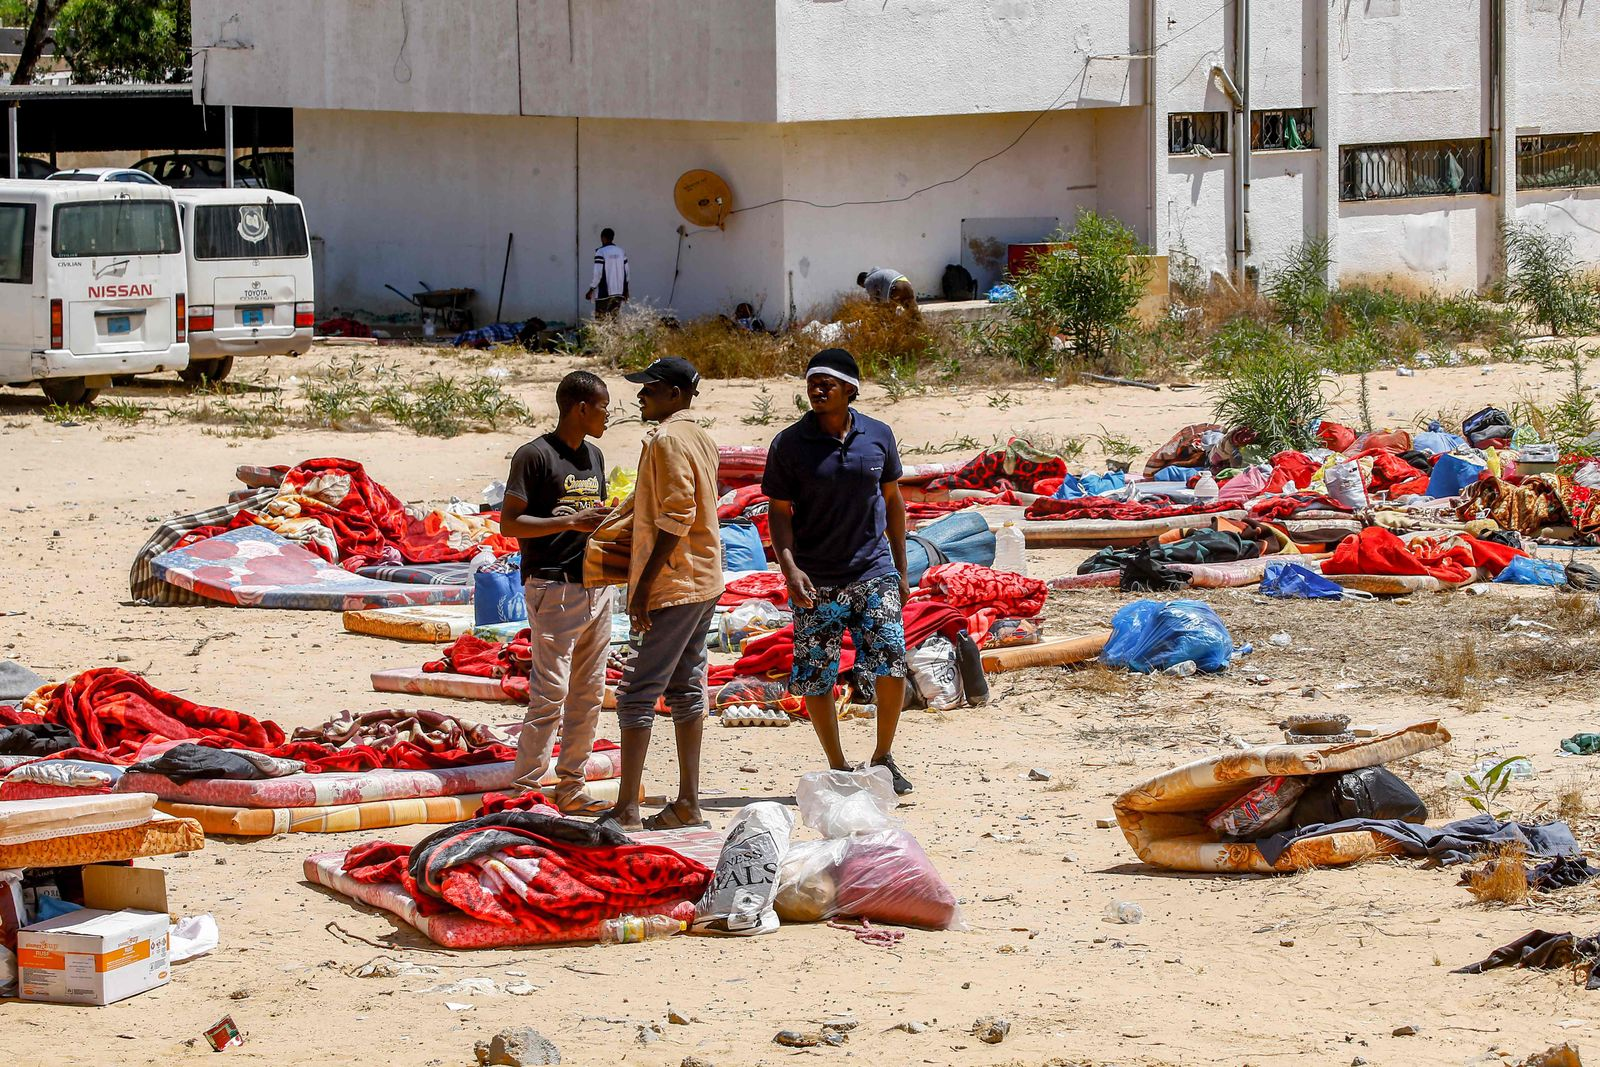 Libyen/Flüchtlinge